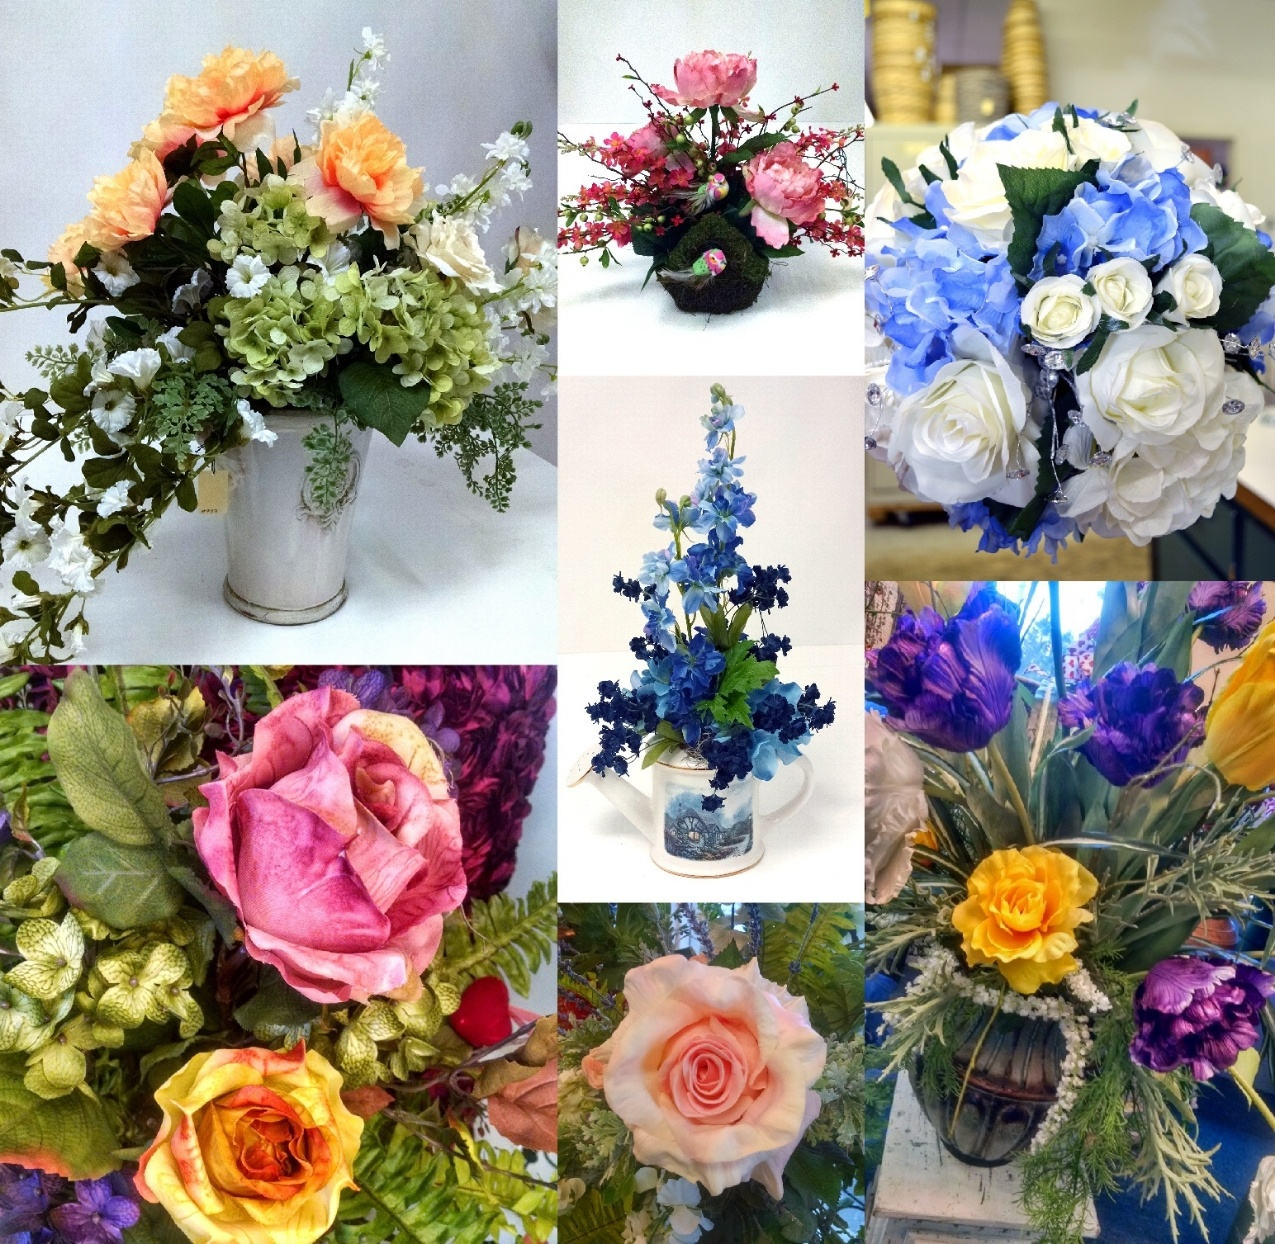 Gillespie florists blog silk flowers indianapolis silks mightylinksfo